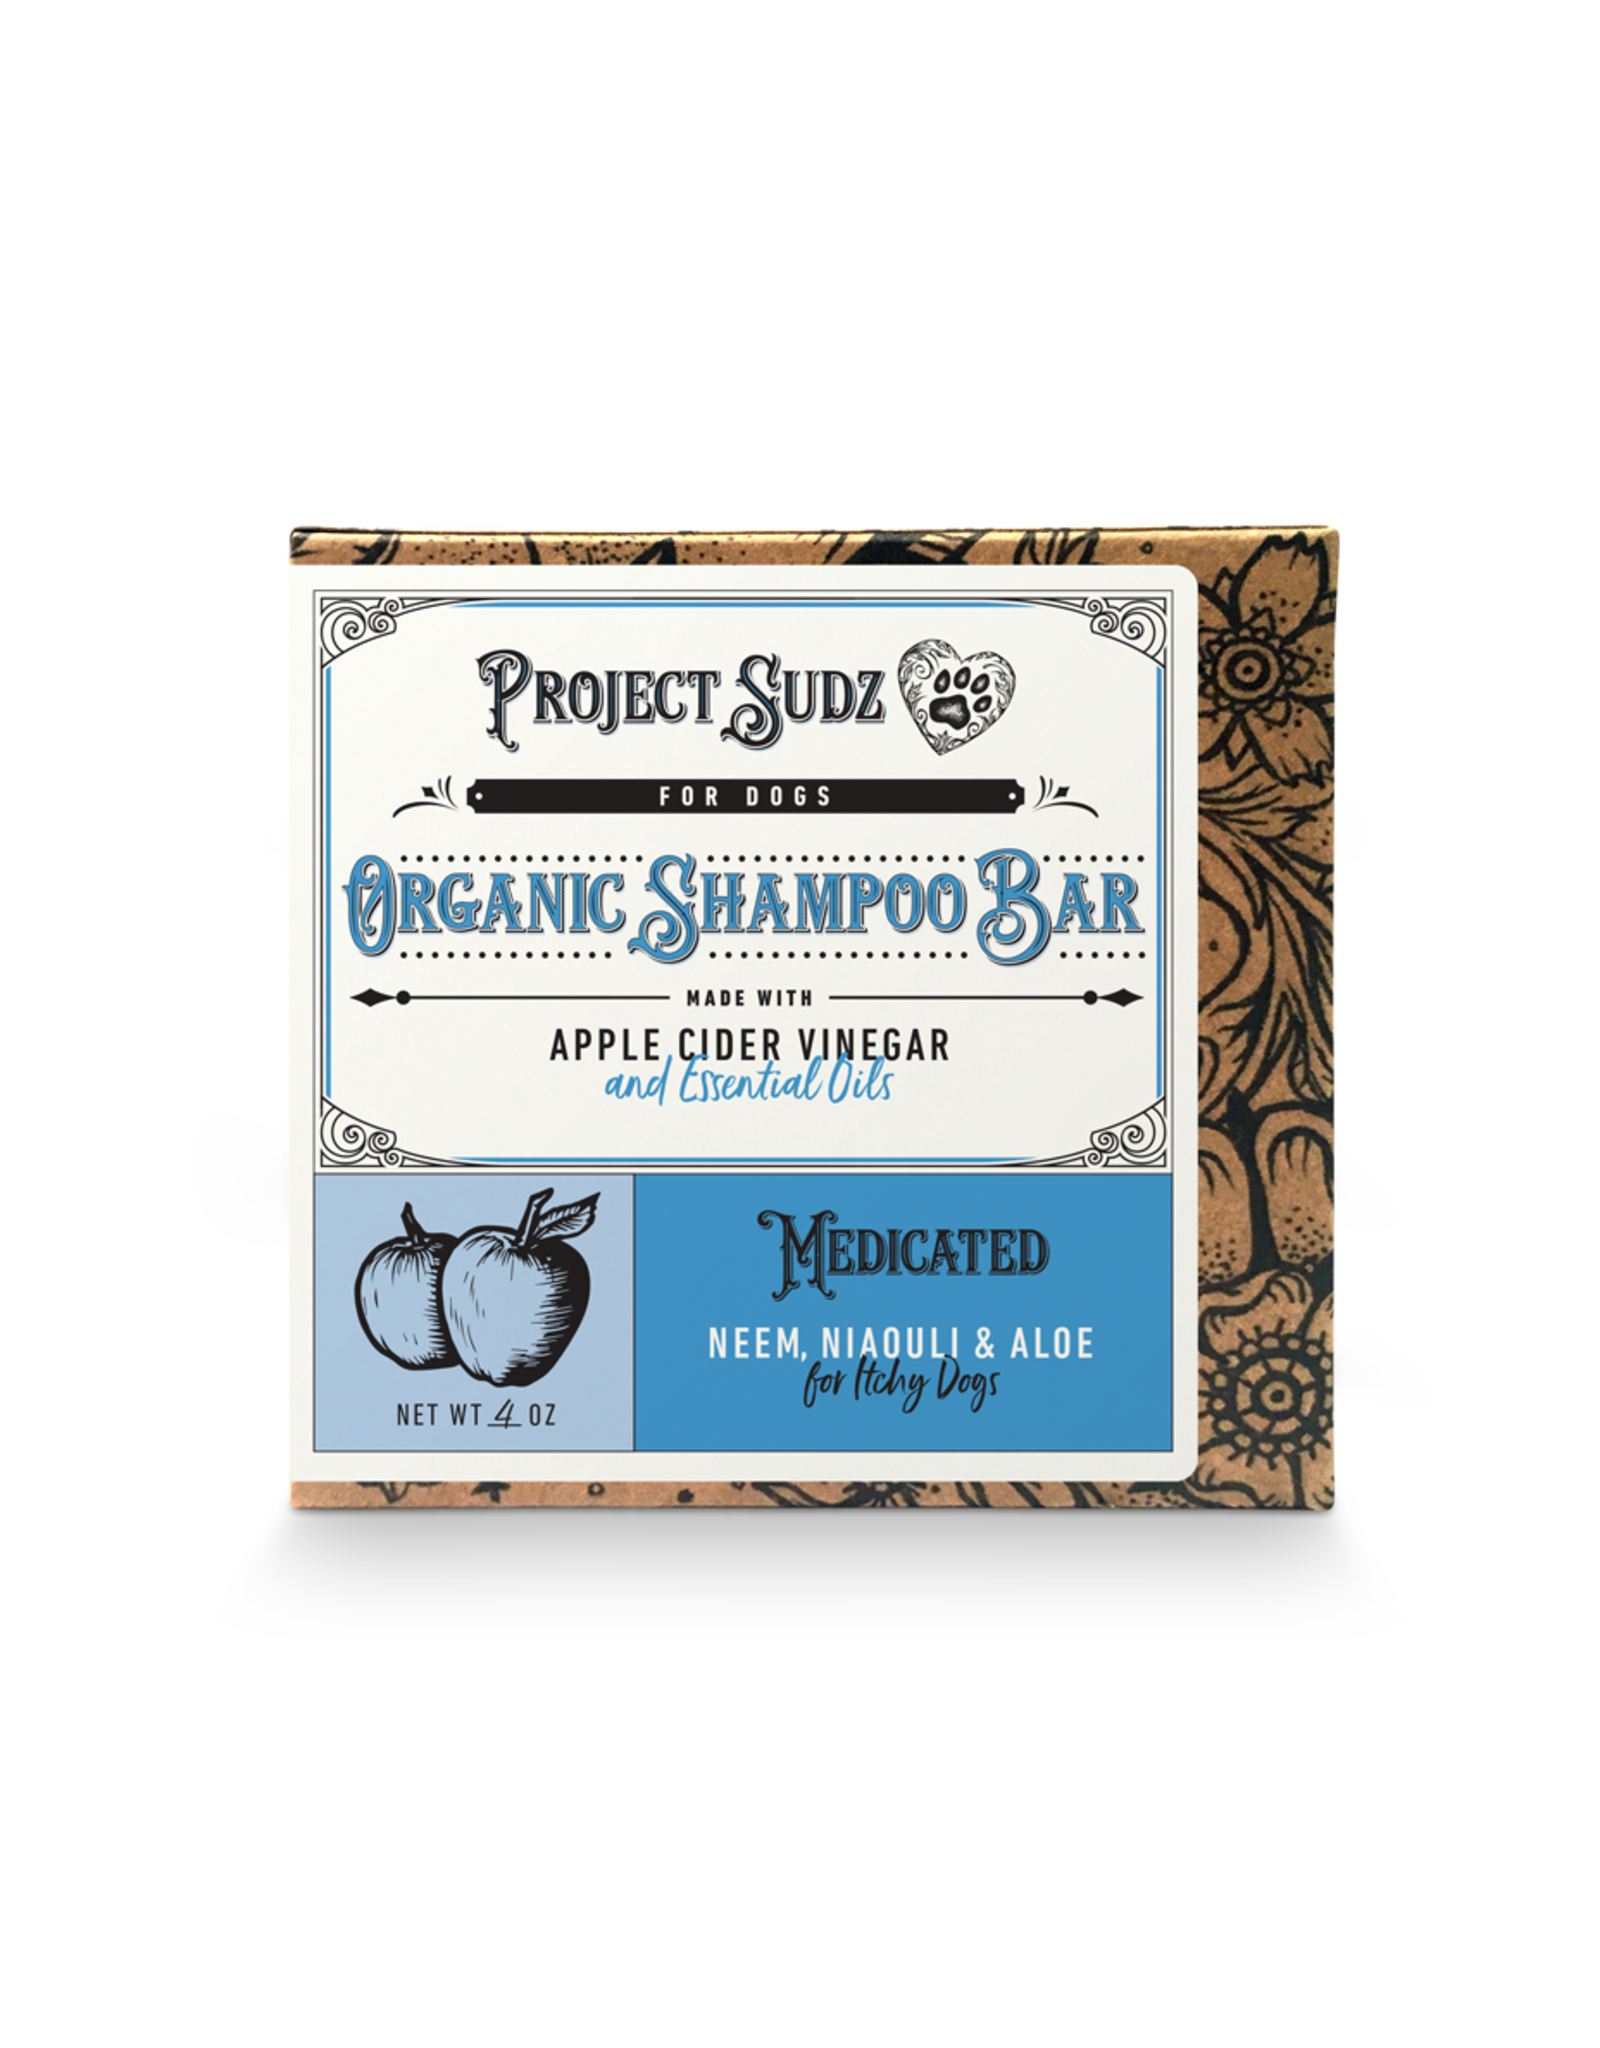 Project Sudz Project Sudz Medicated Shampoo Bar